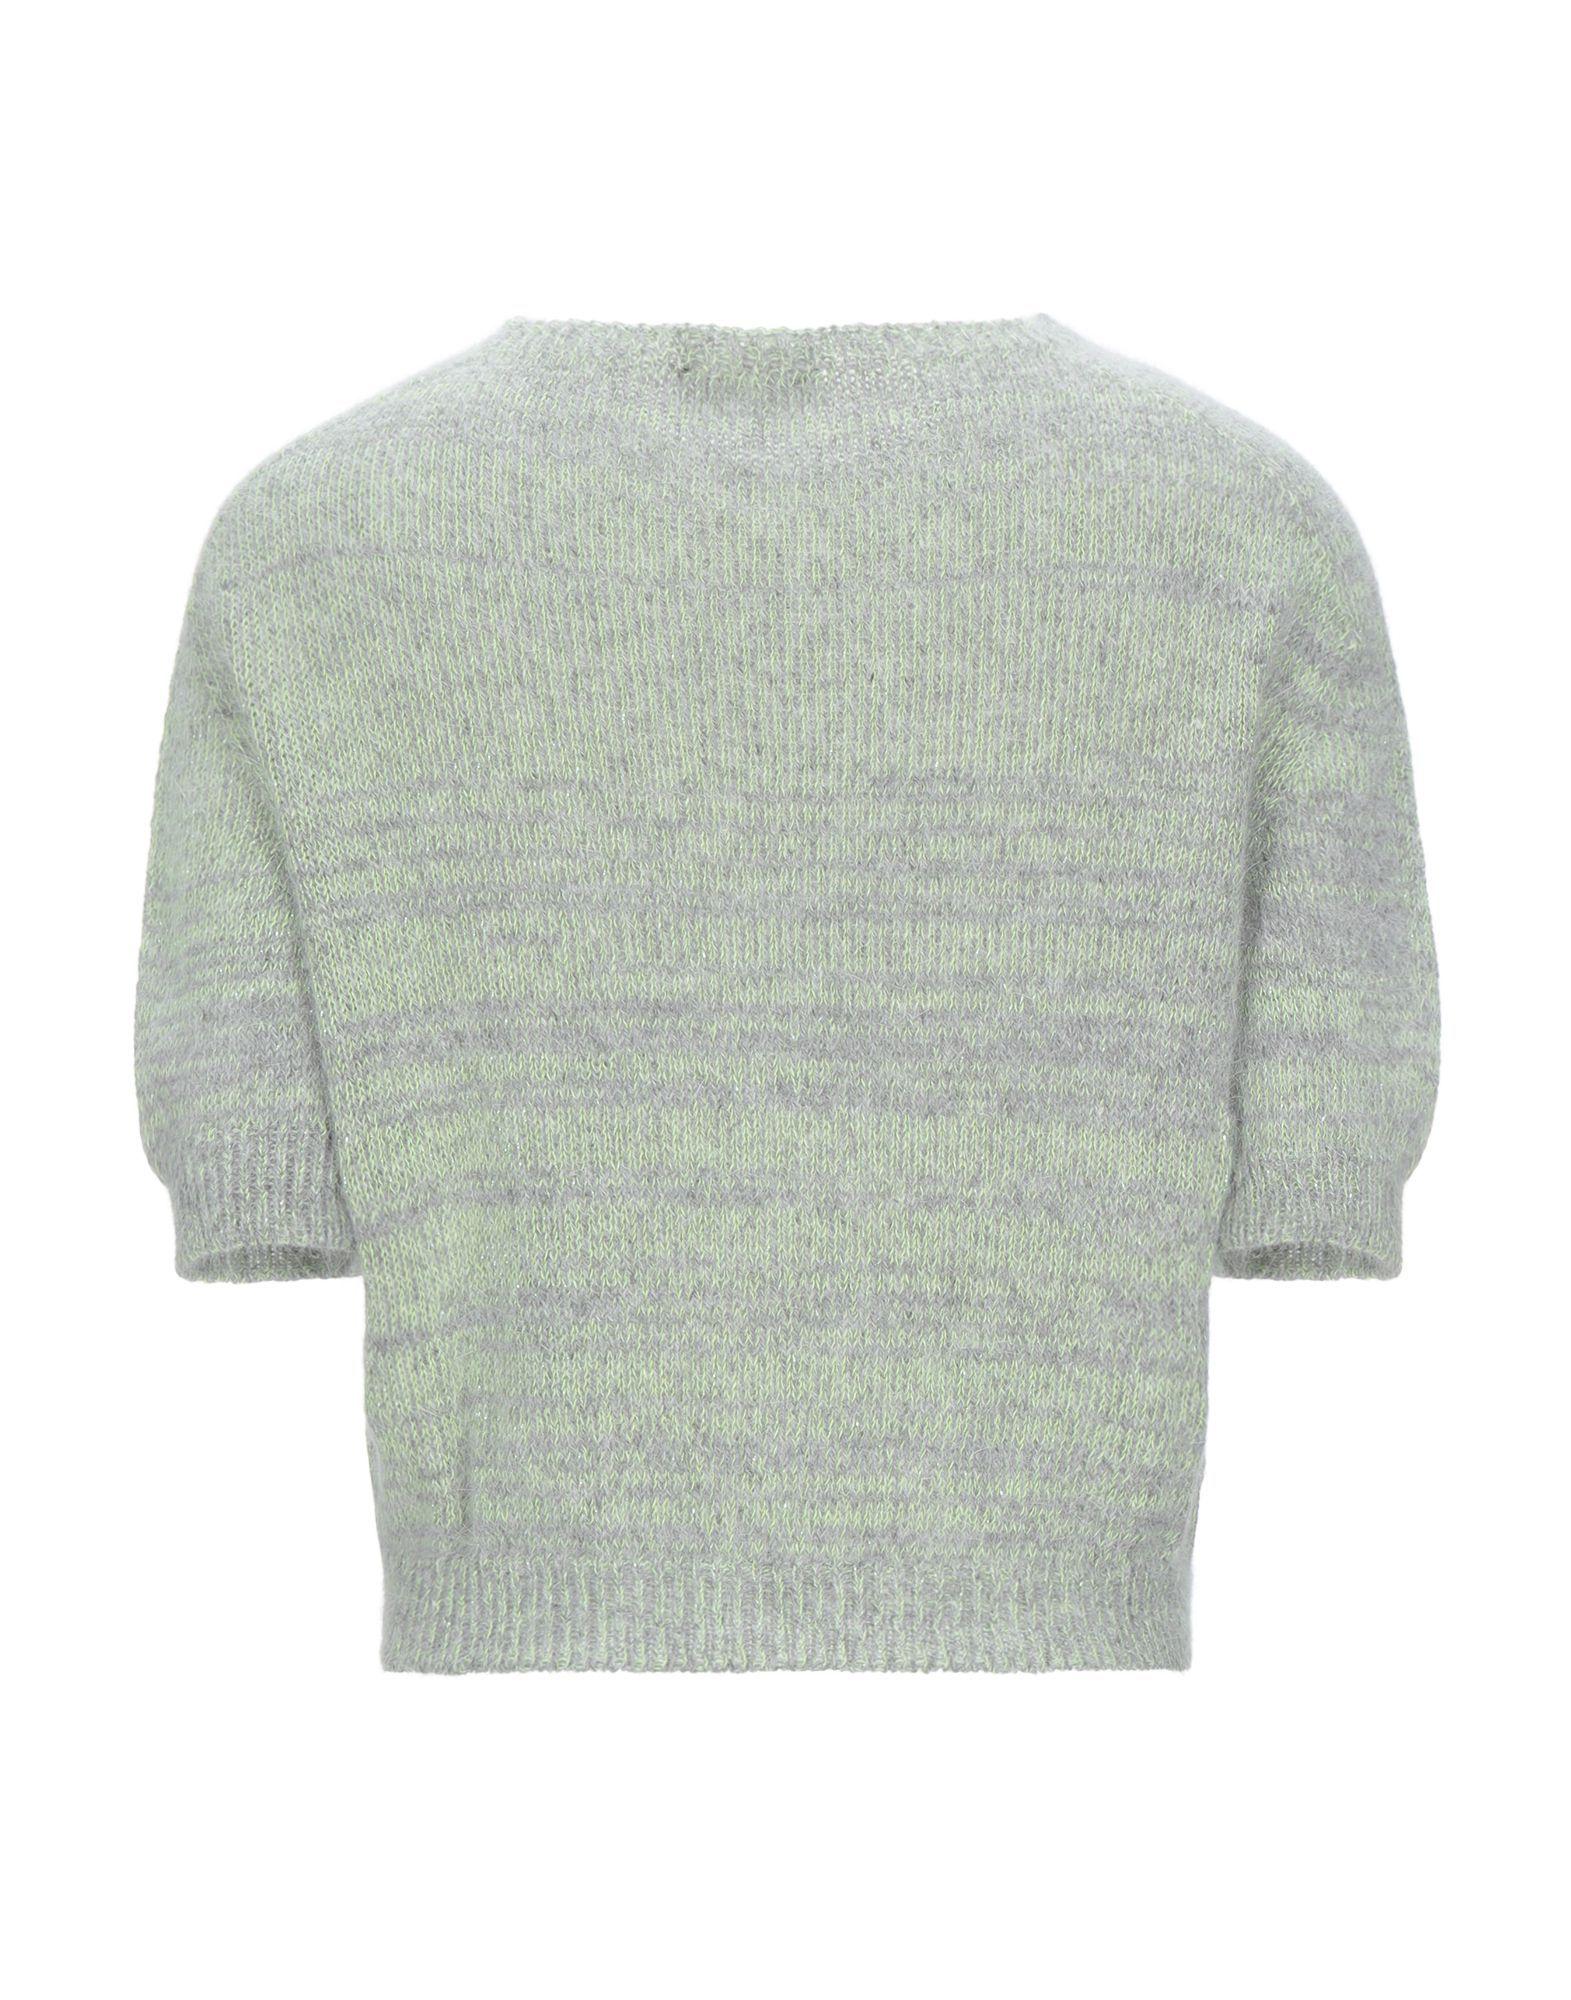 Roberto Collina Acid Green Angora Short Sleeve Knit Jumper